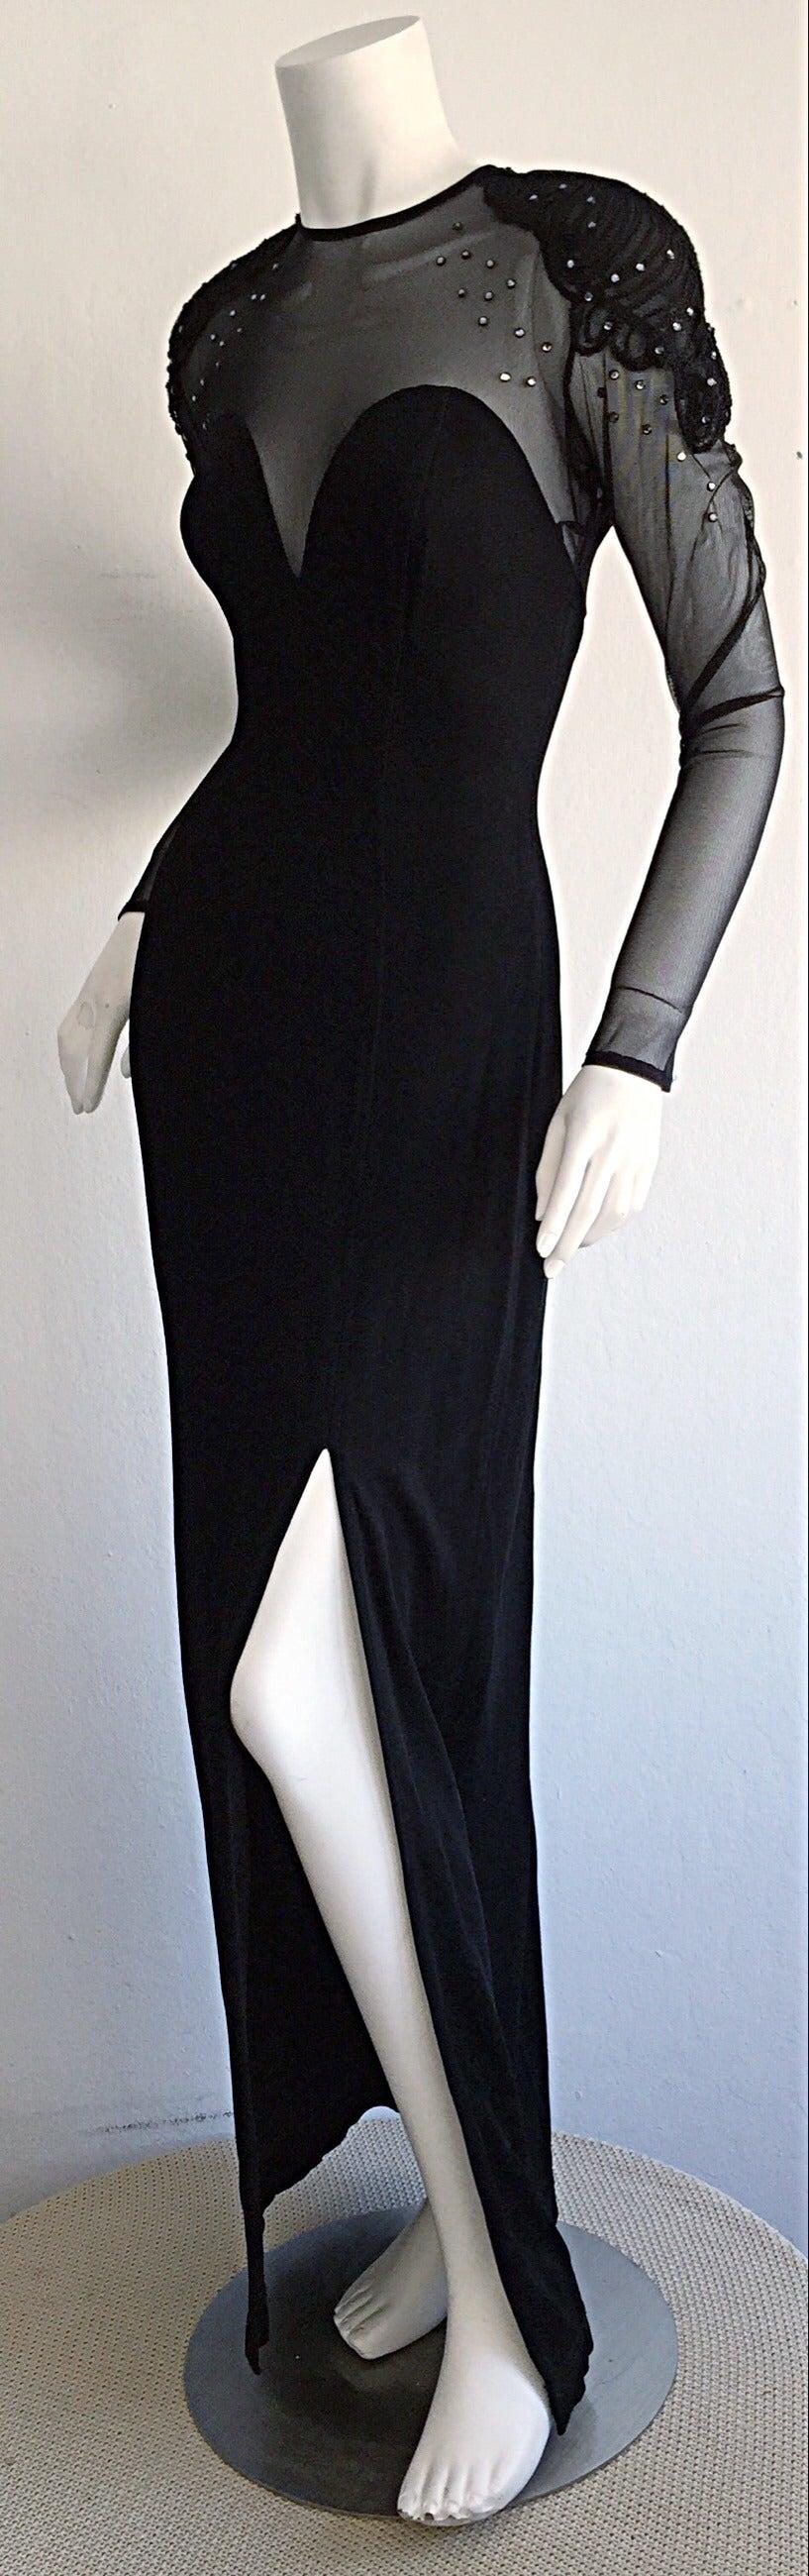 Sexy Vintage 1990s Black Cut - Out Bodycon Dress w/ Rhinestones 8